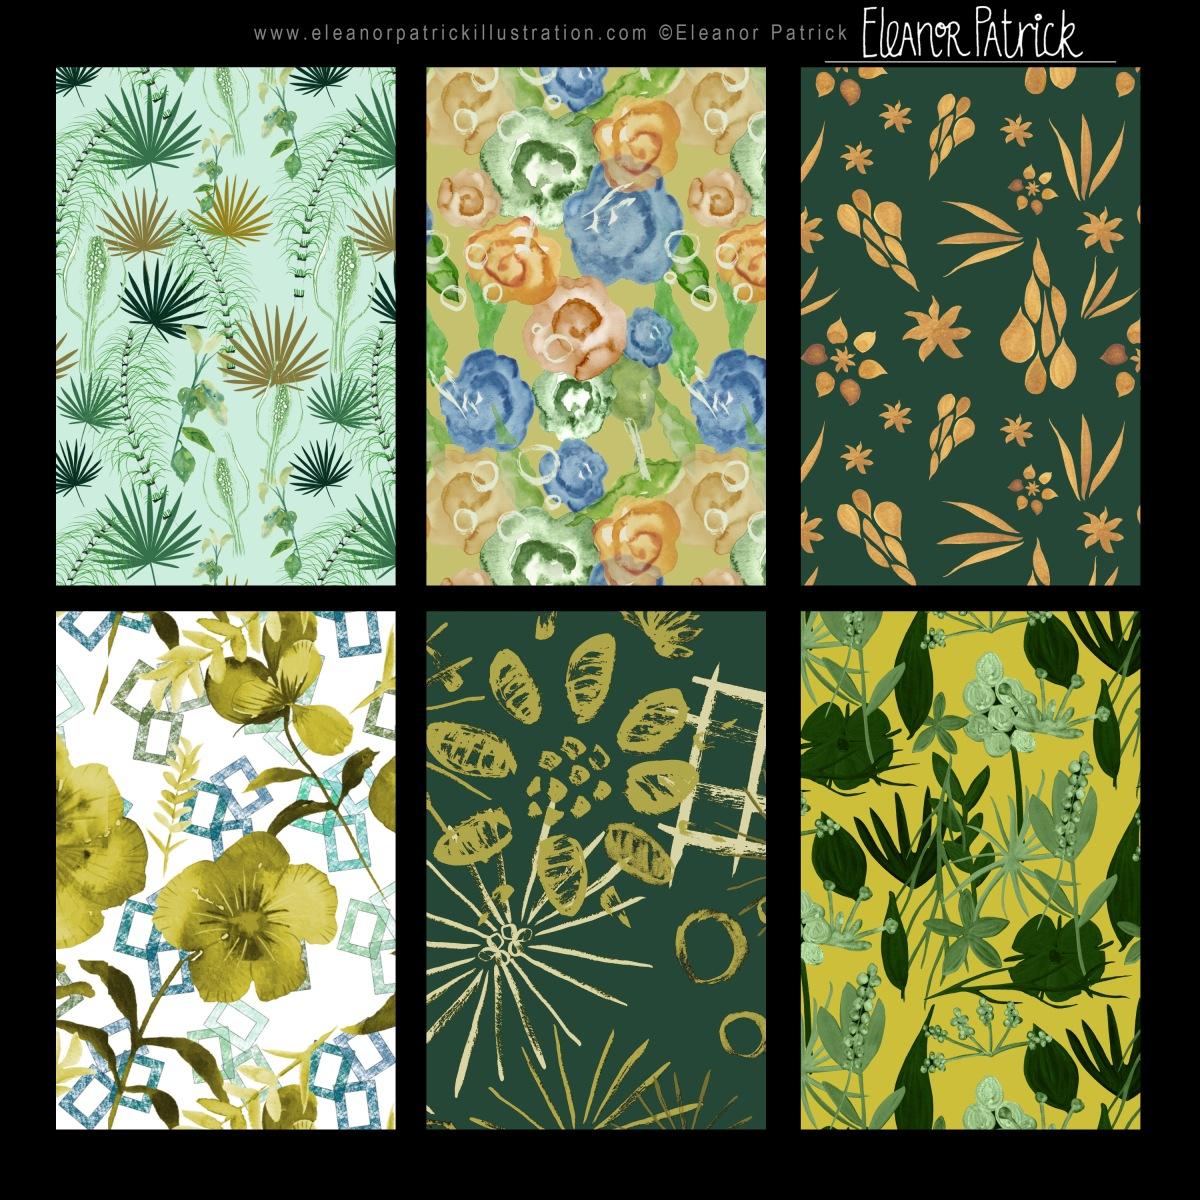 6 more wallpapers samples